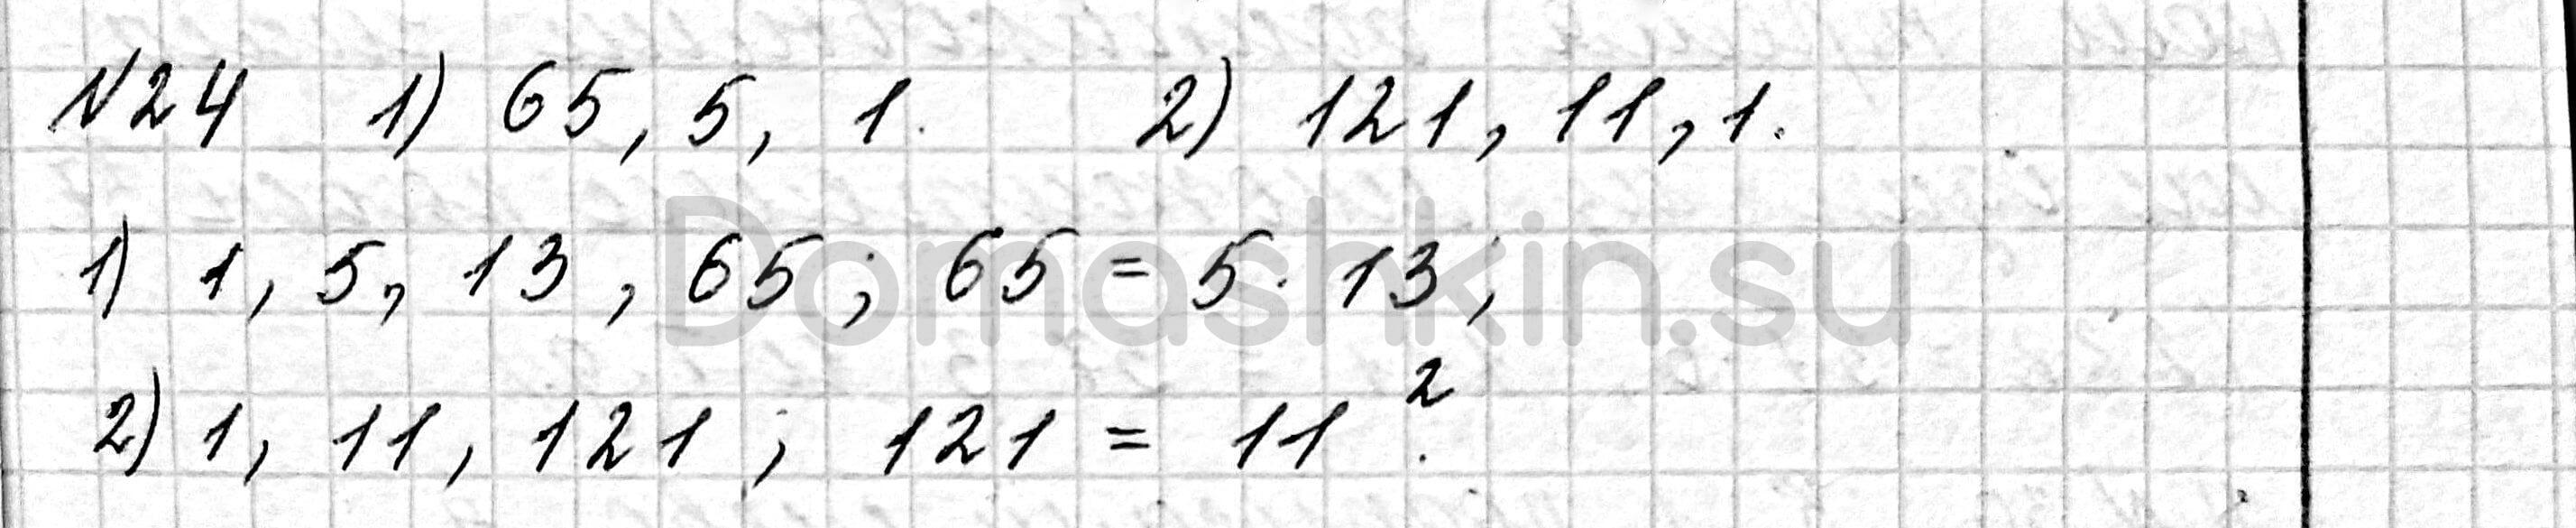 Математика 6 класс учебник Мерзляк номер 24 решение